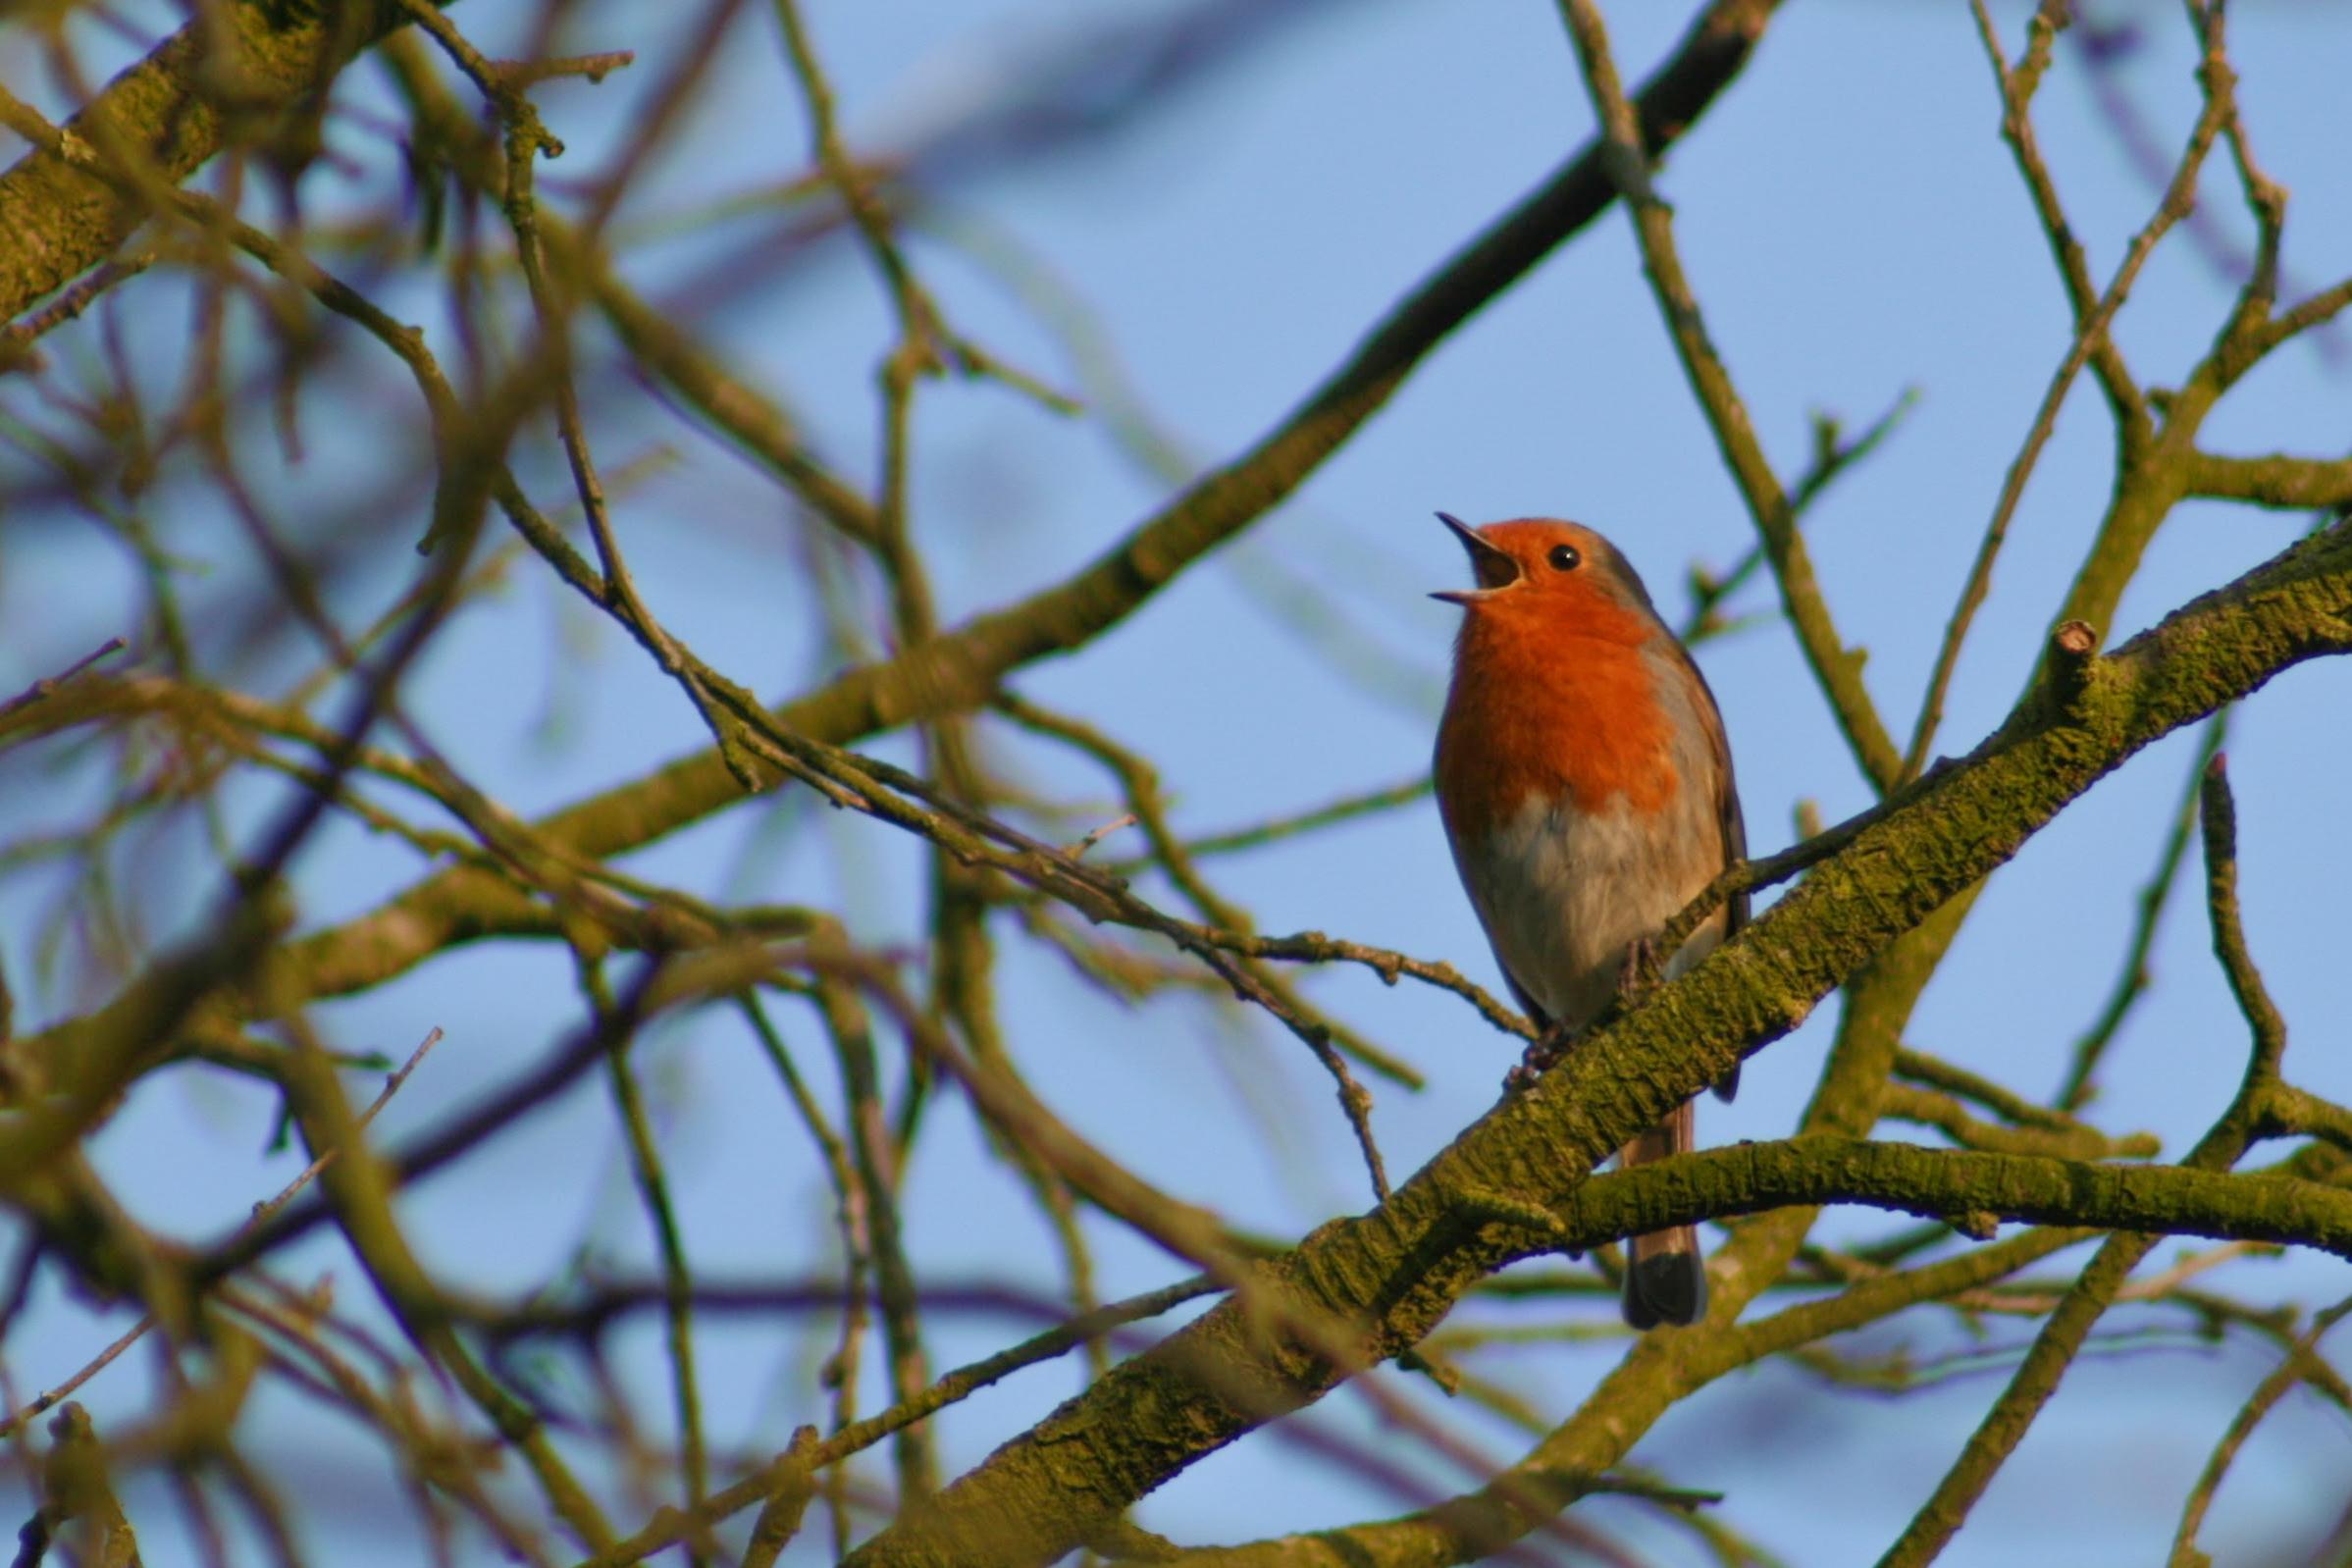 A robin displaying territorial singing behaviour